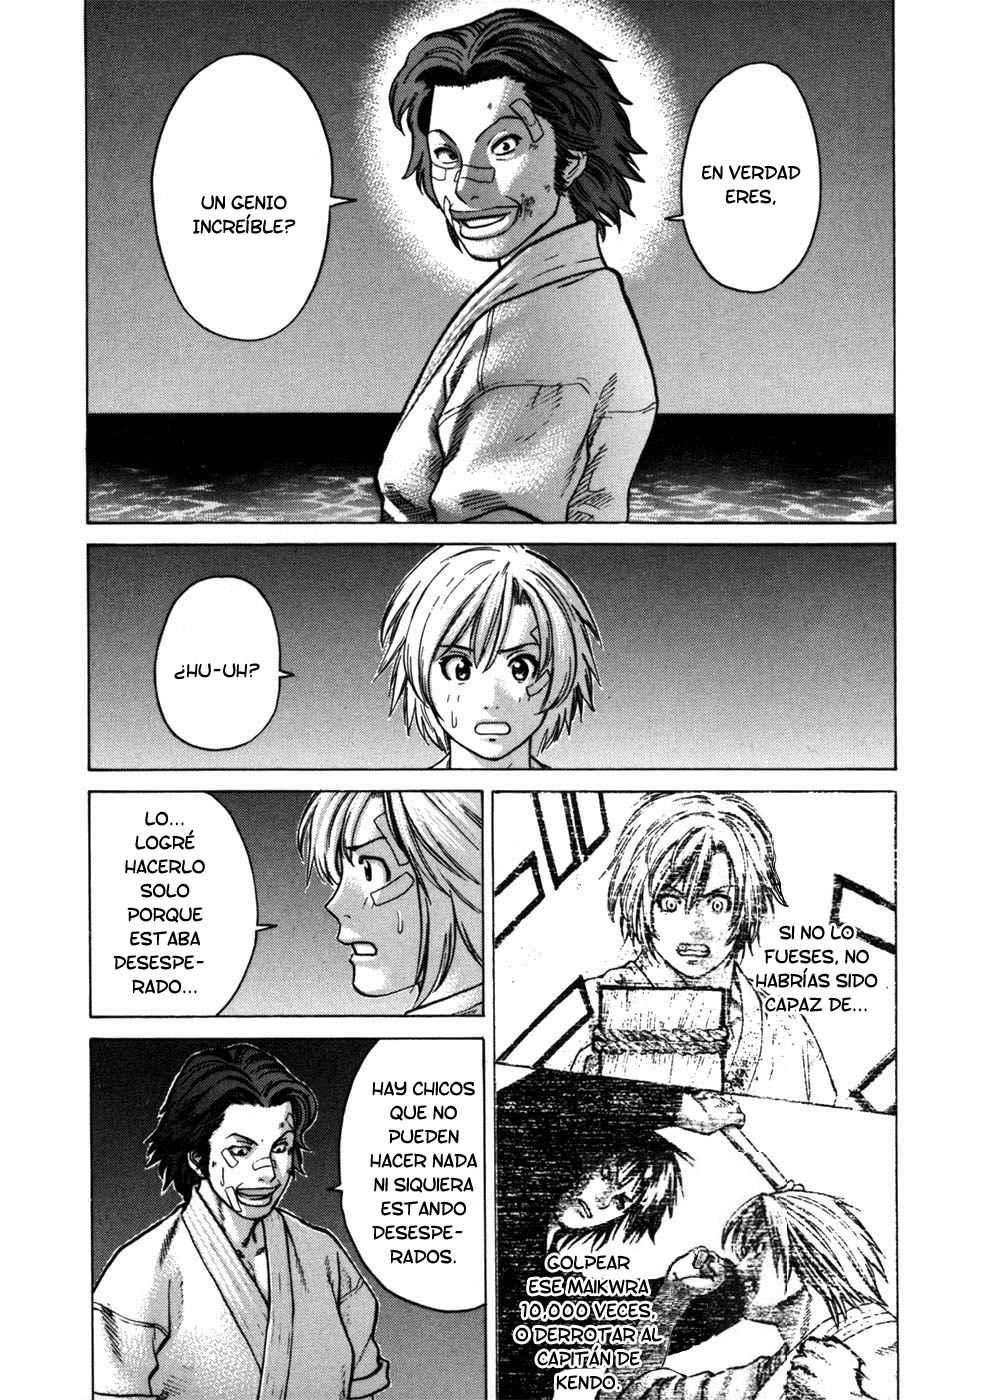 http://c5.ninemanga.com/es_manga/53/501/454740/379c1c7599cd30862208a6f67131ec99.jpg Page 5